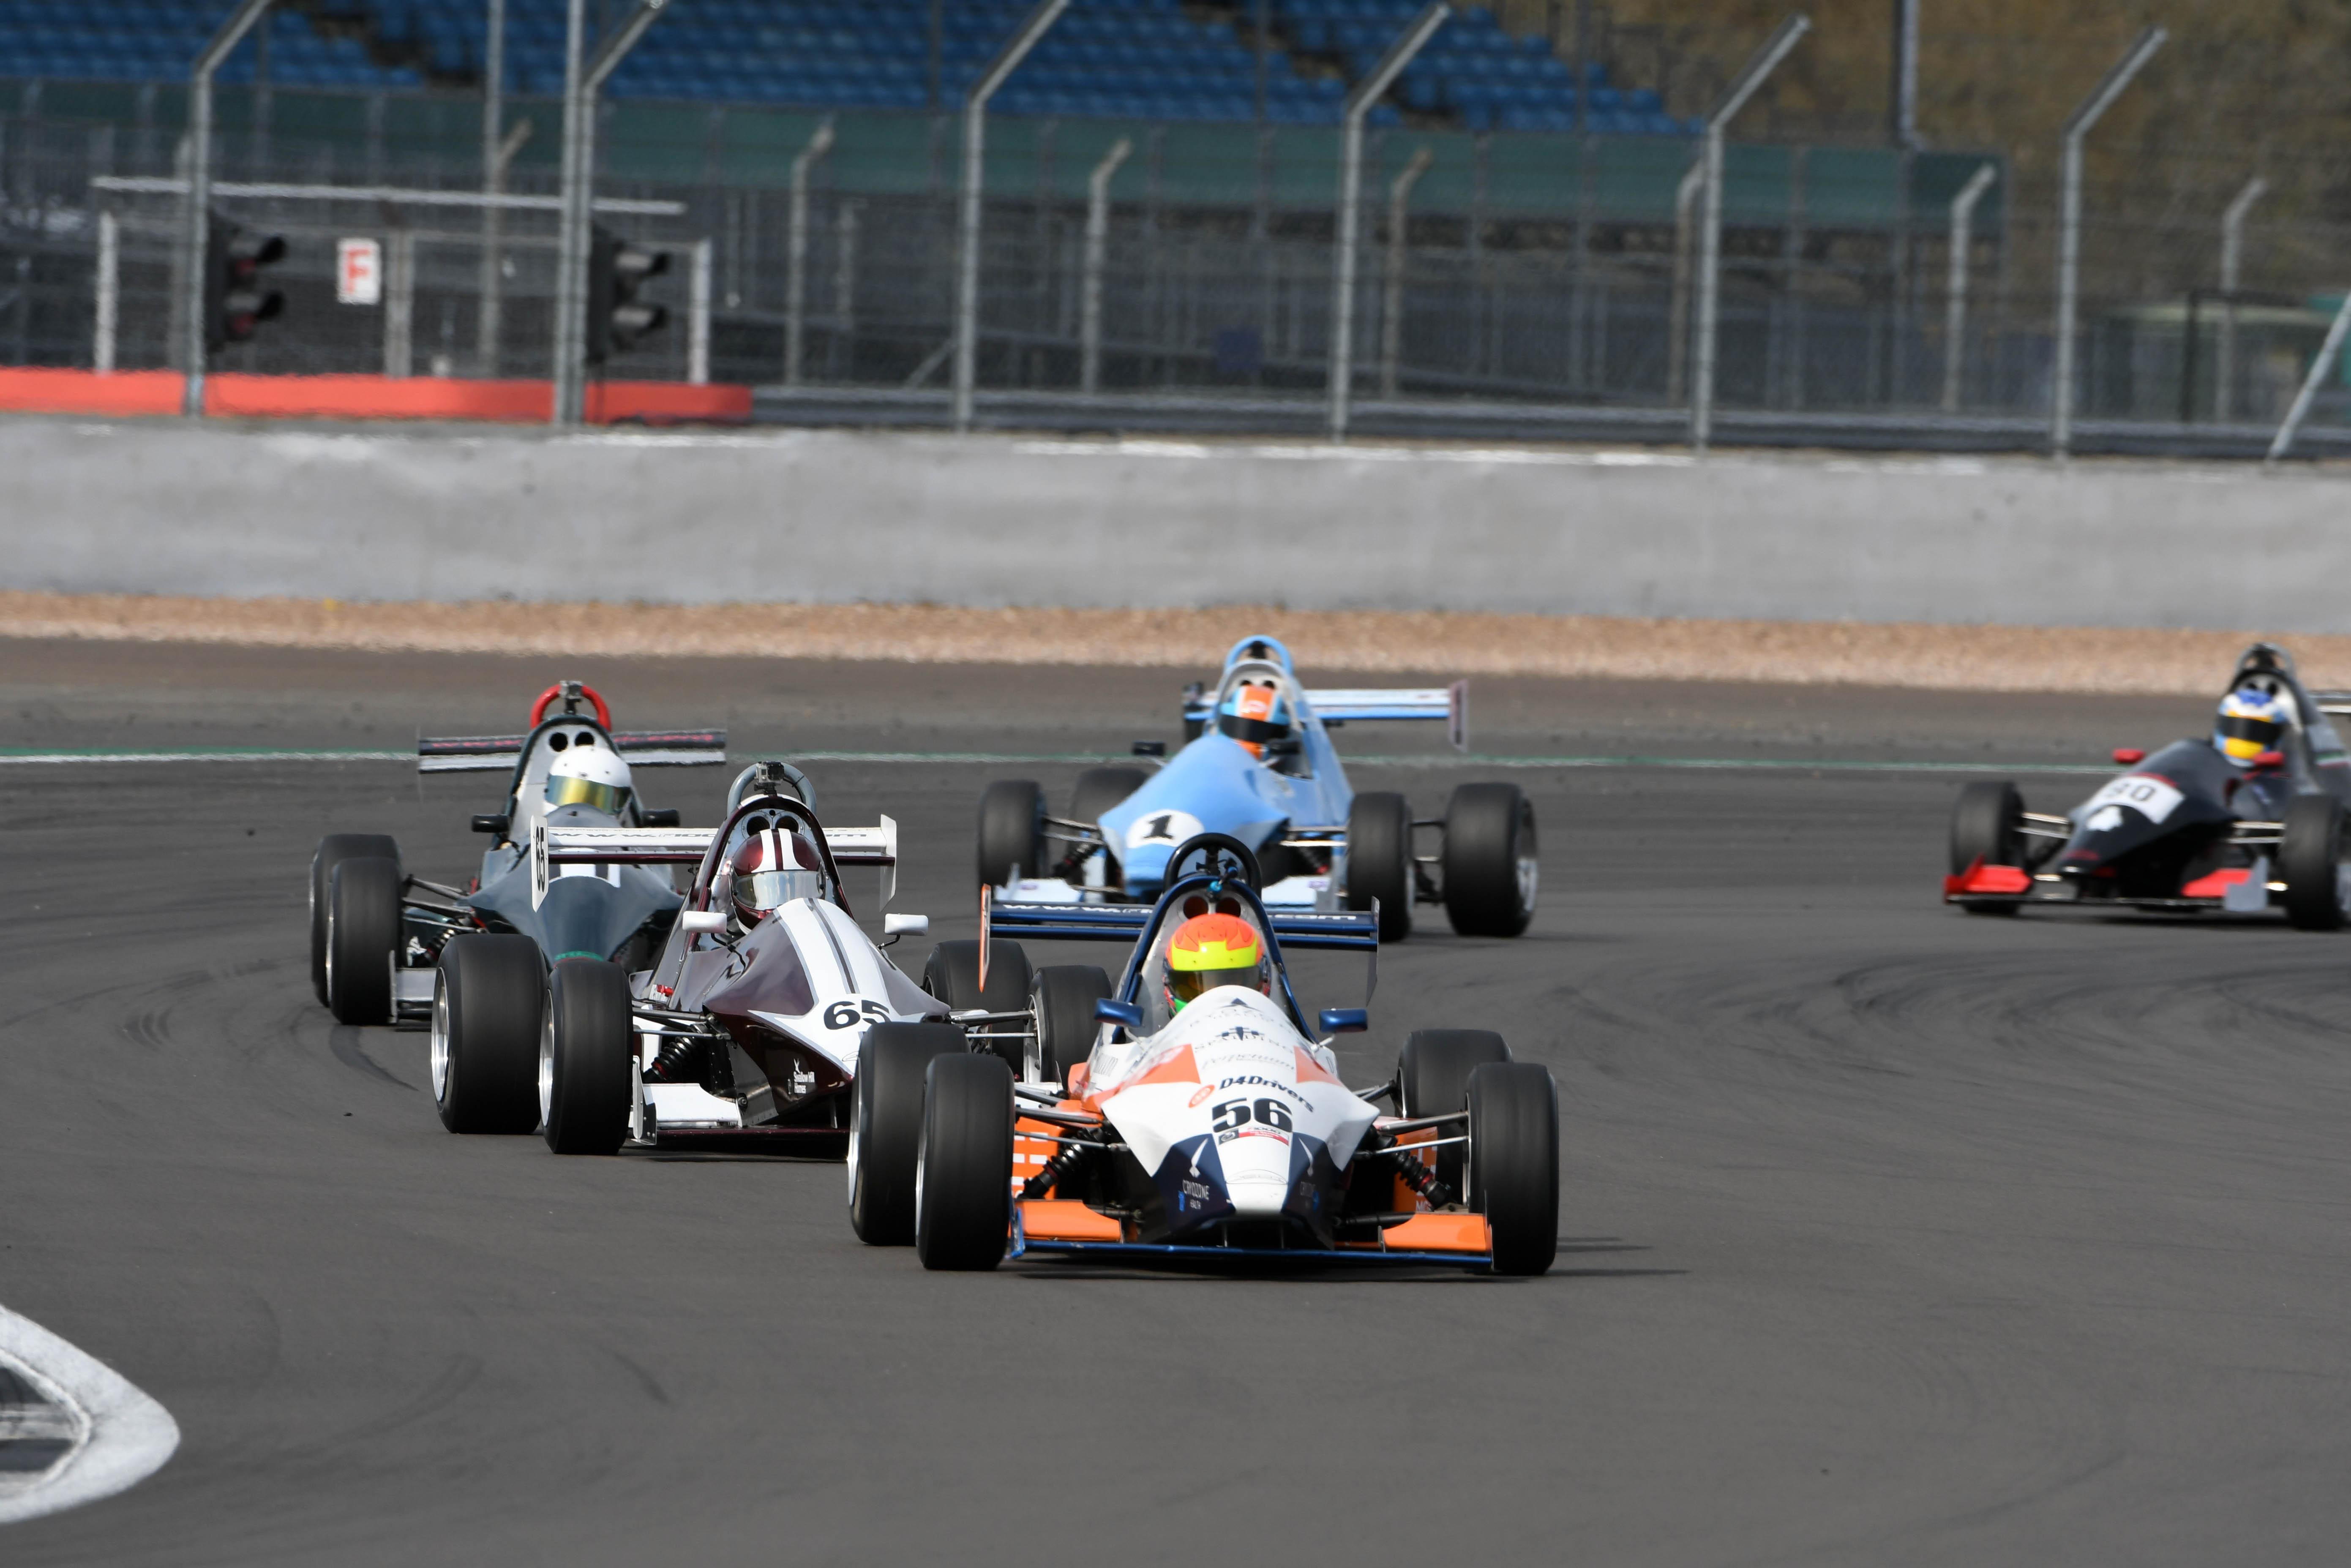 Lee Morgan, F1000 Championship, Silverstone